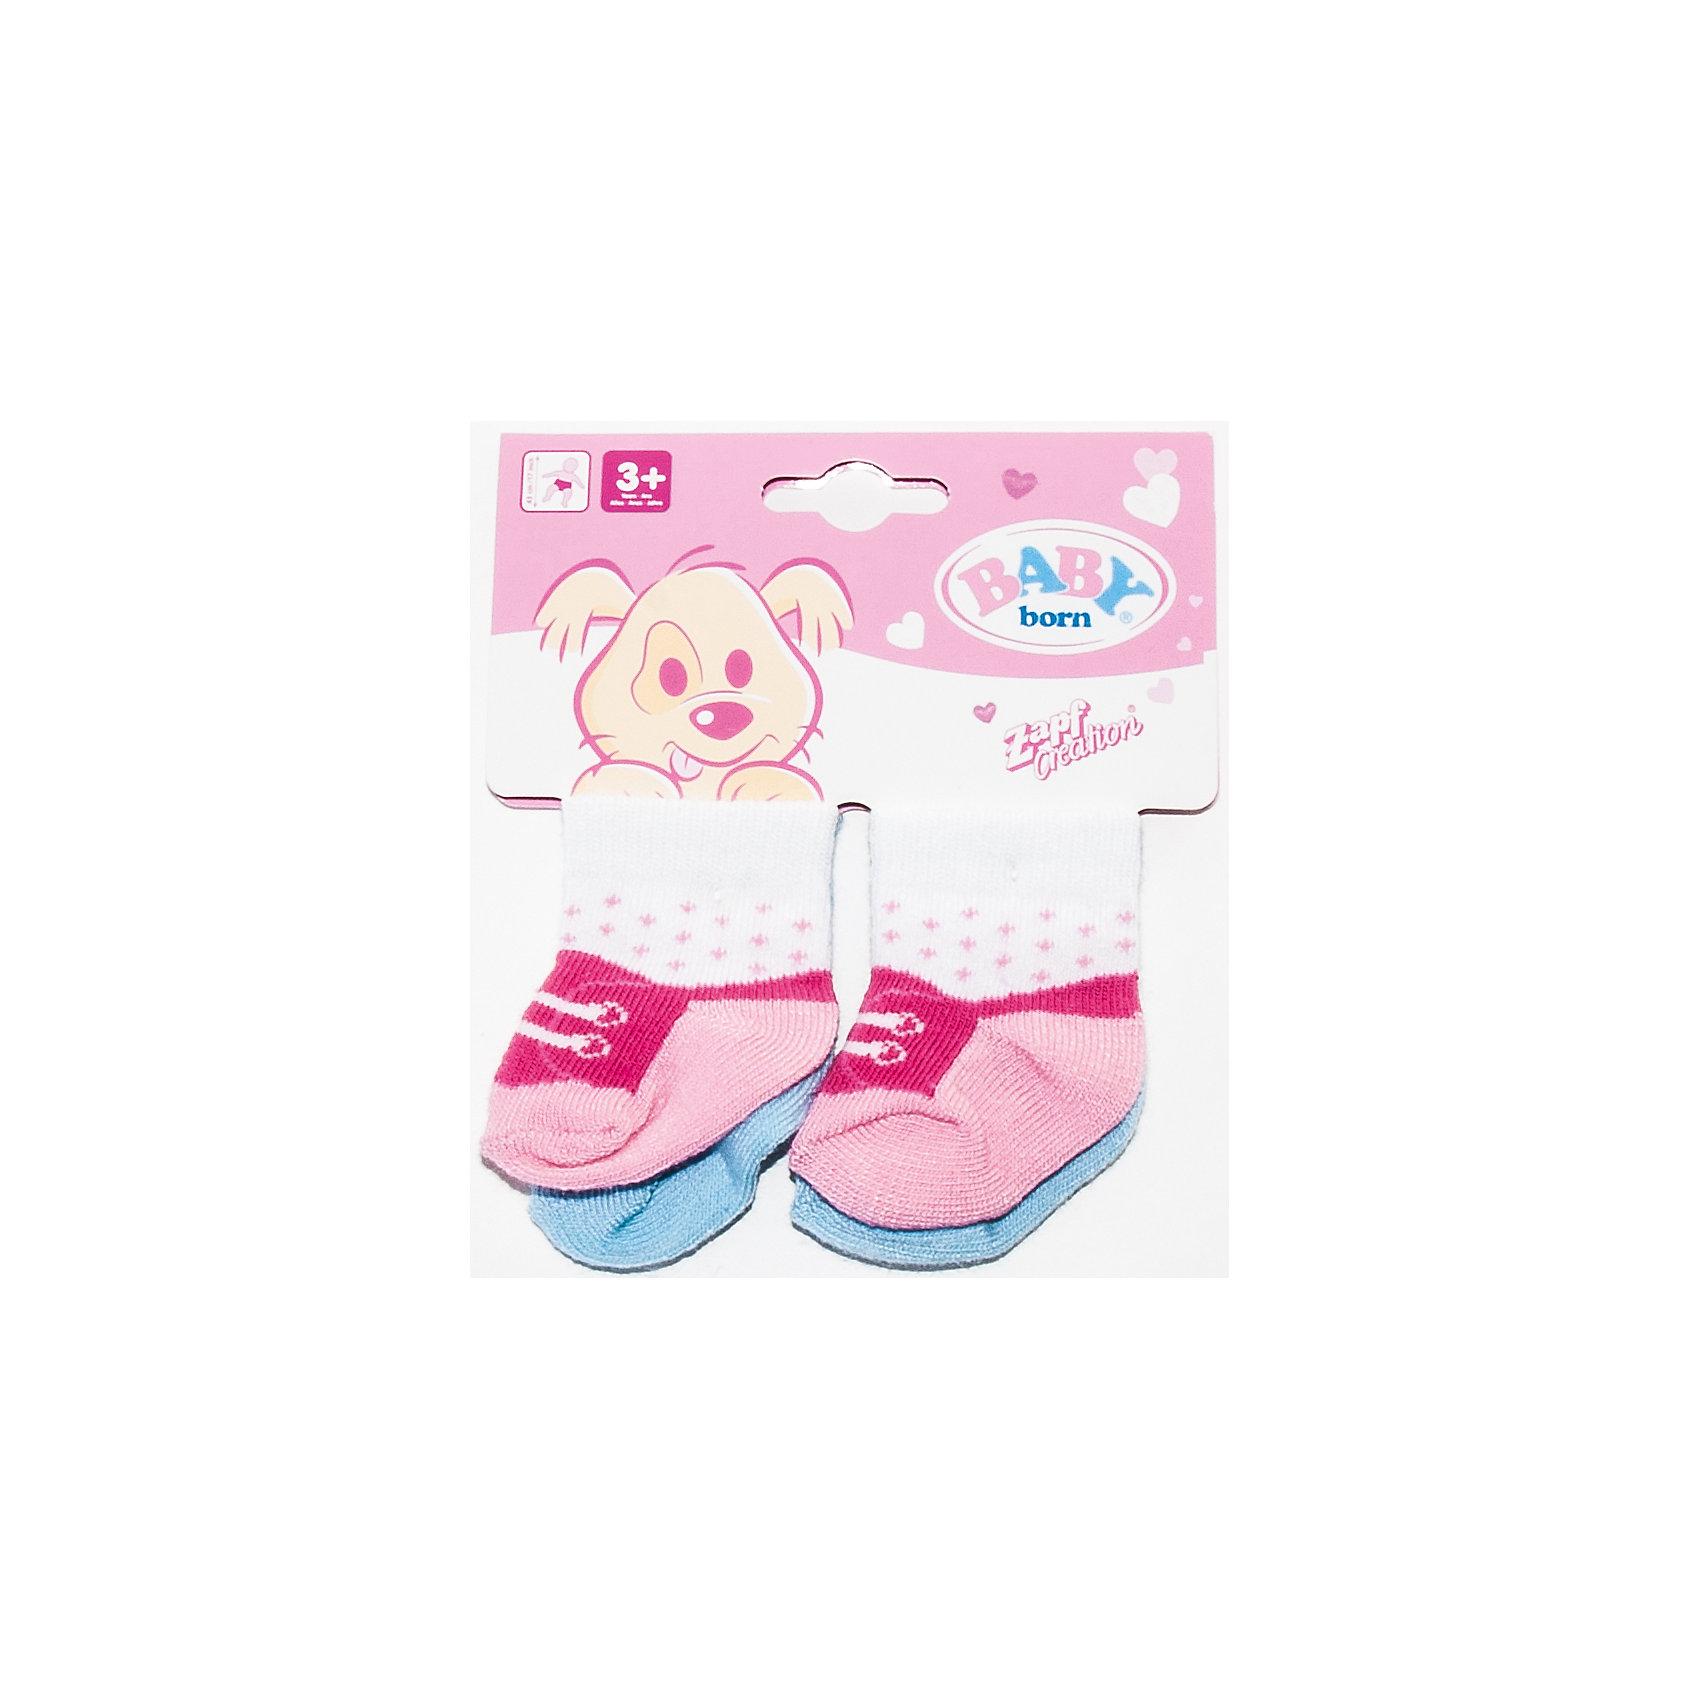 Zapf Creation Носки 2 пары, розовые, BABY born куклы и одежда для кукол zapf creation baby annabell памперсы 5 штук